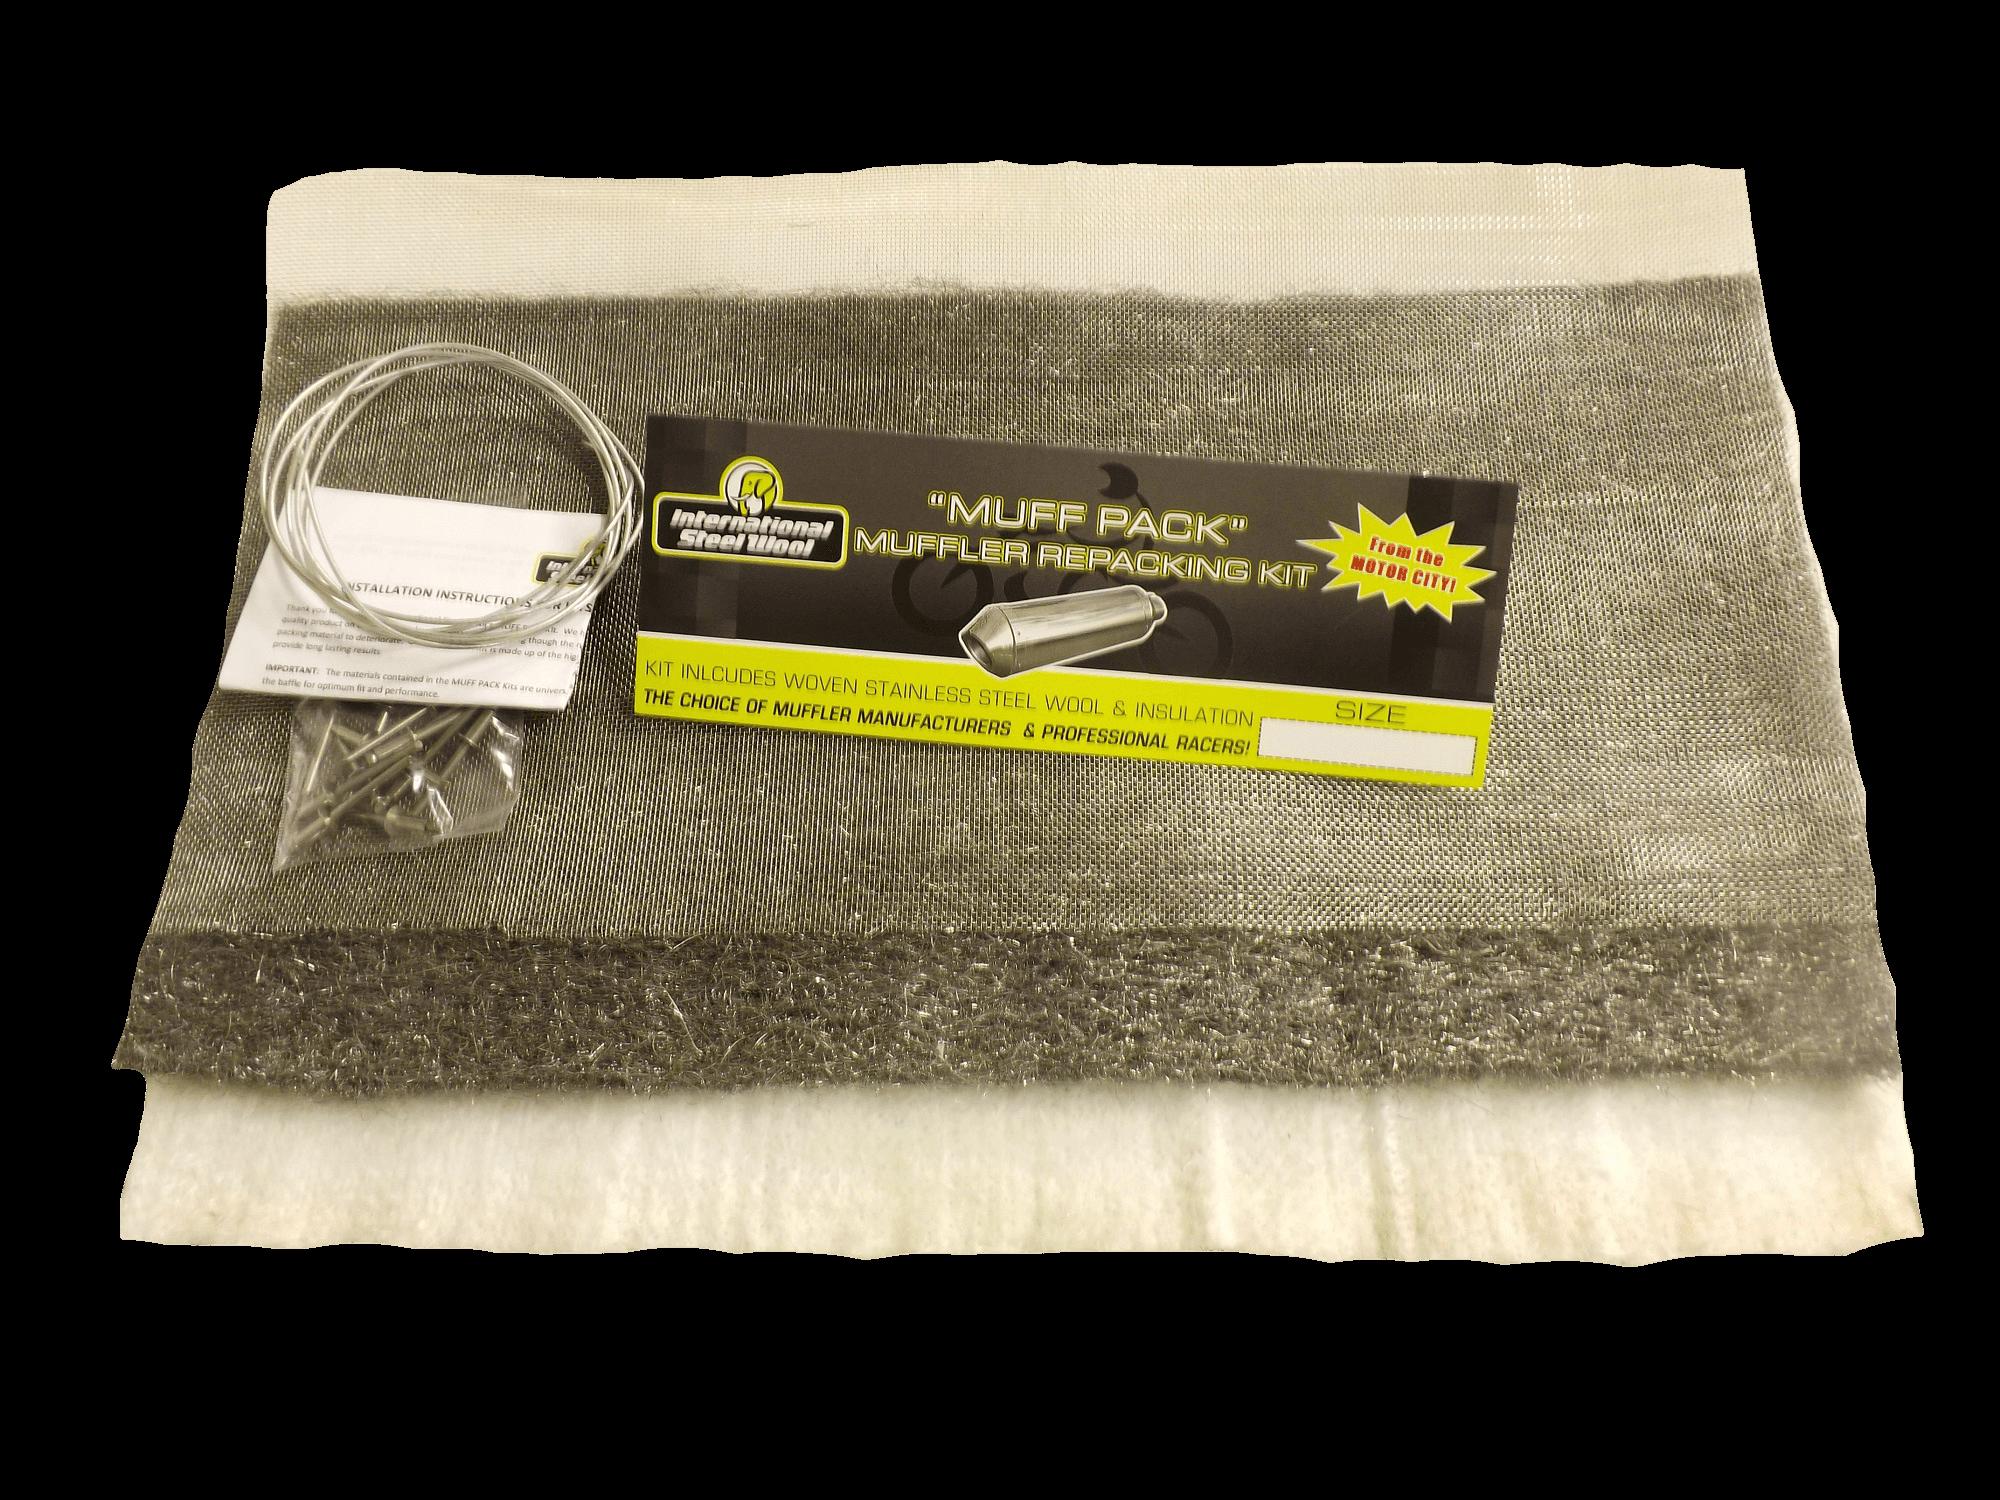 Muffler packing for Steel wool insulation